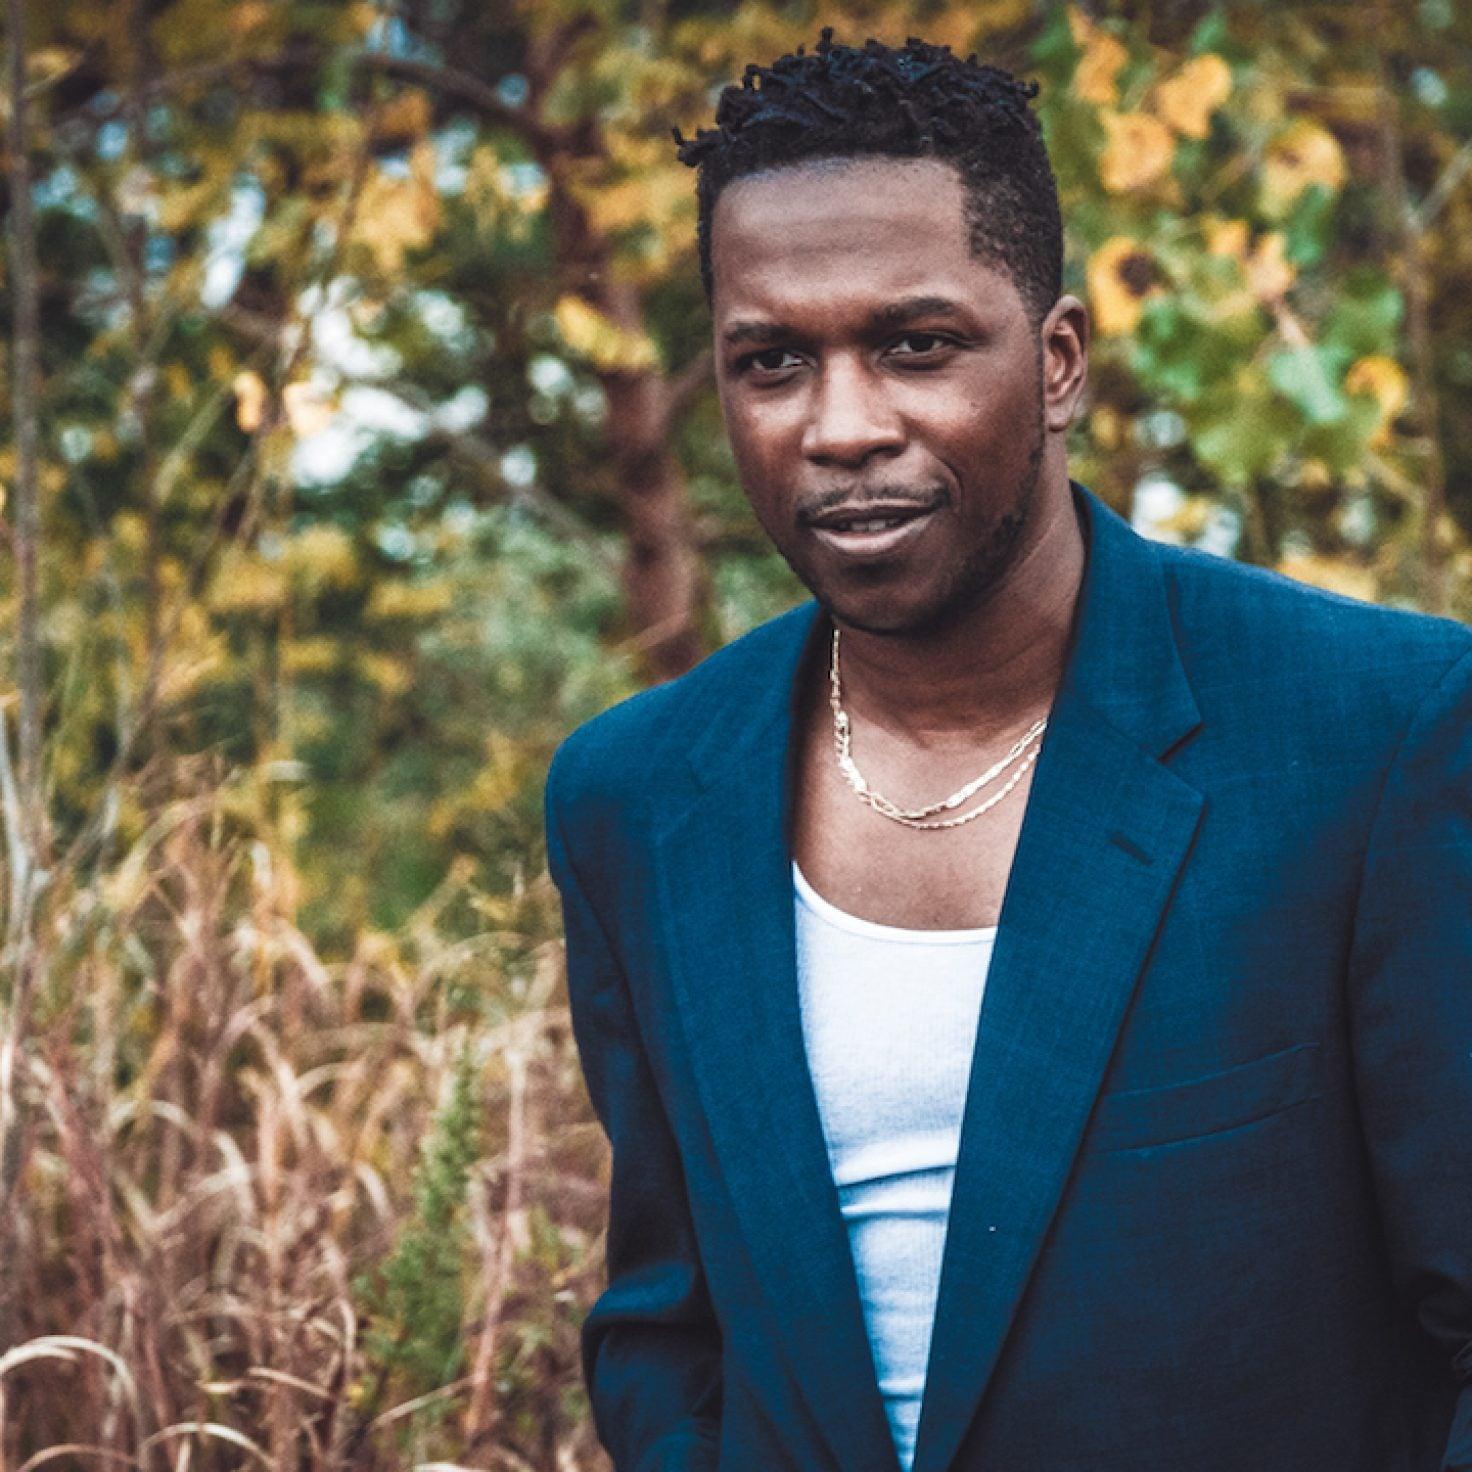 Leslie Odom Jr. Taps 'Burning Cane' Director For 'Stronger Magic' Music Video